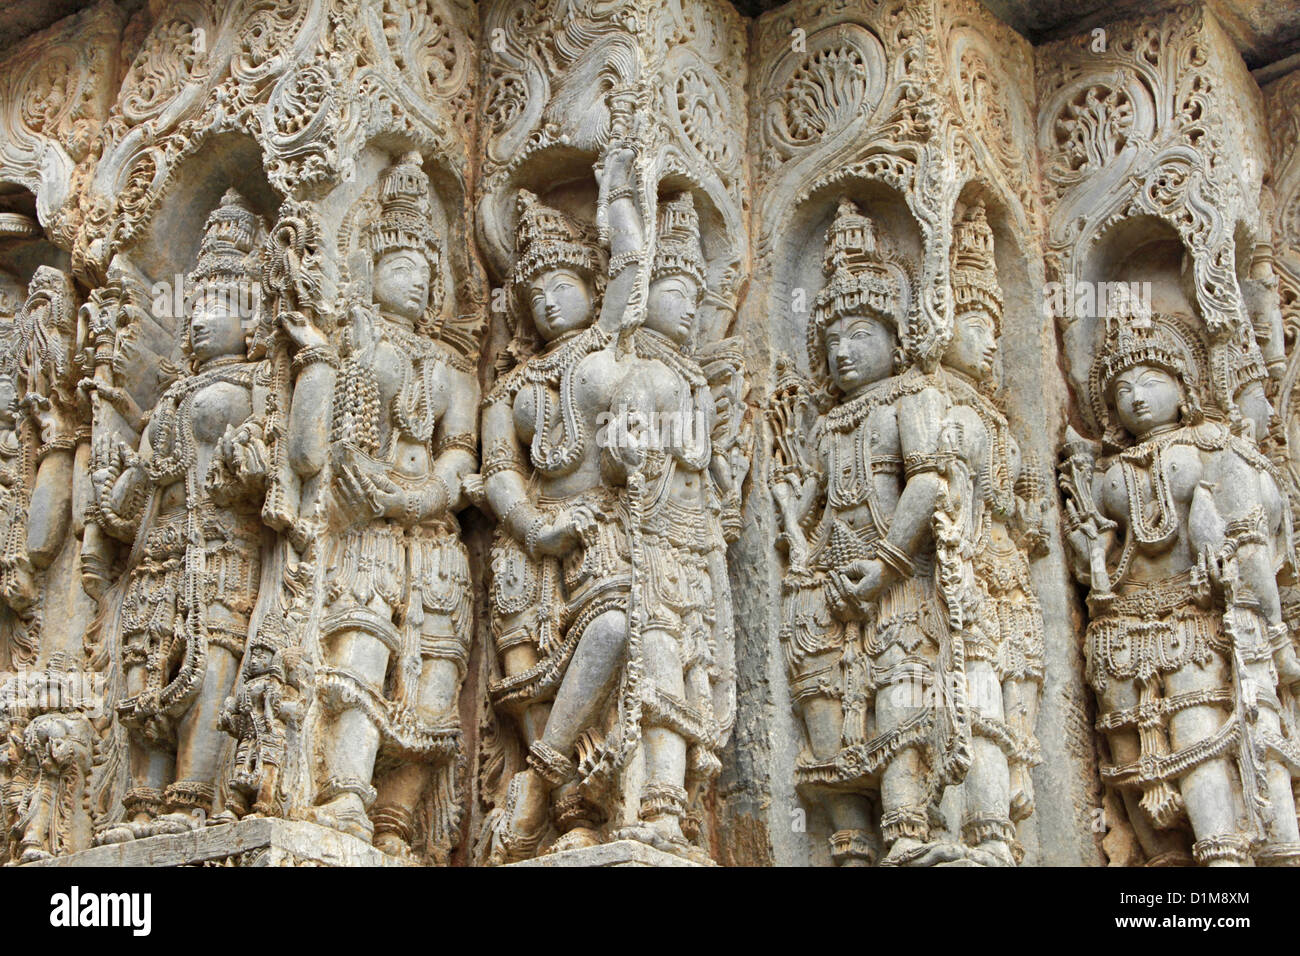 Murs décorés de Hoysaleswara temple, Halebidu, Hassan District, Karnataka, Inde. Banque D'Images